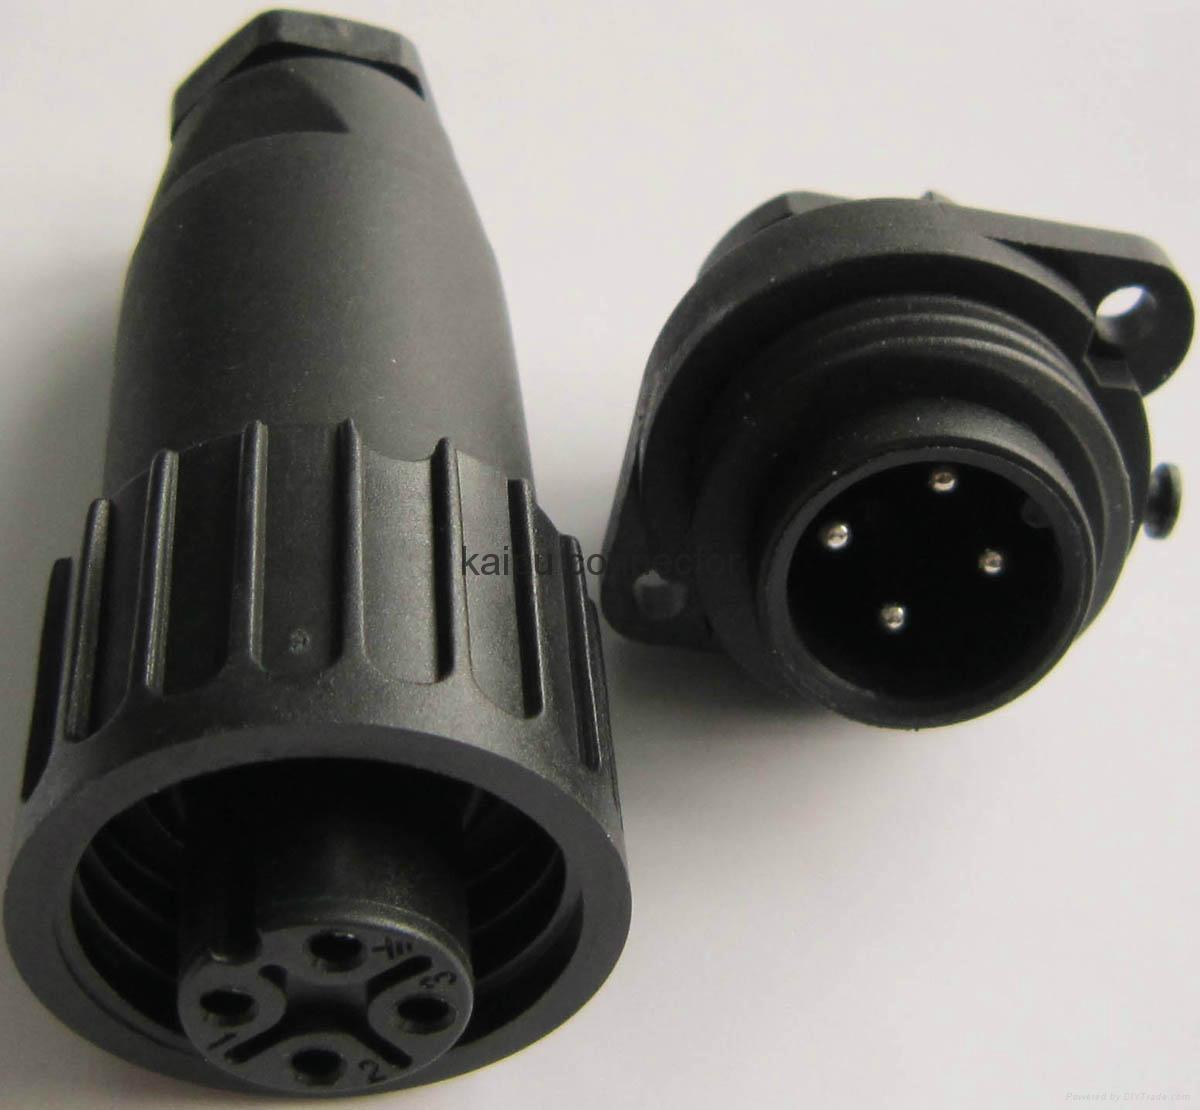 UL认证的KP32型防水电连接器 4